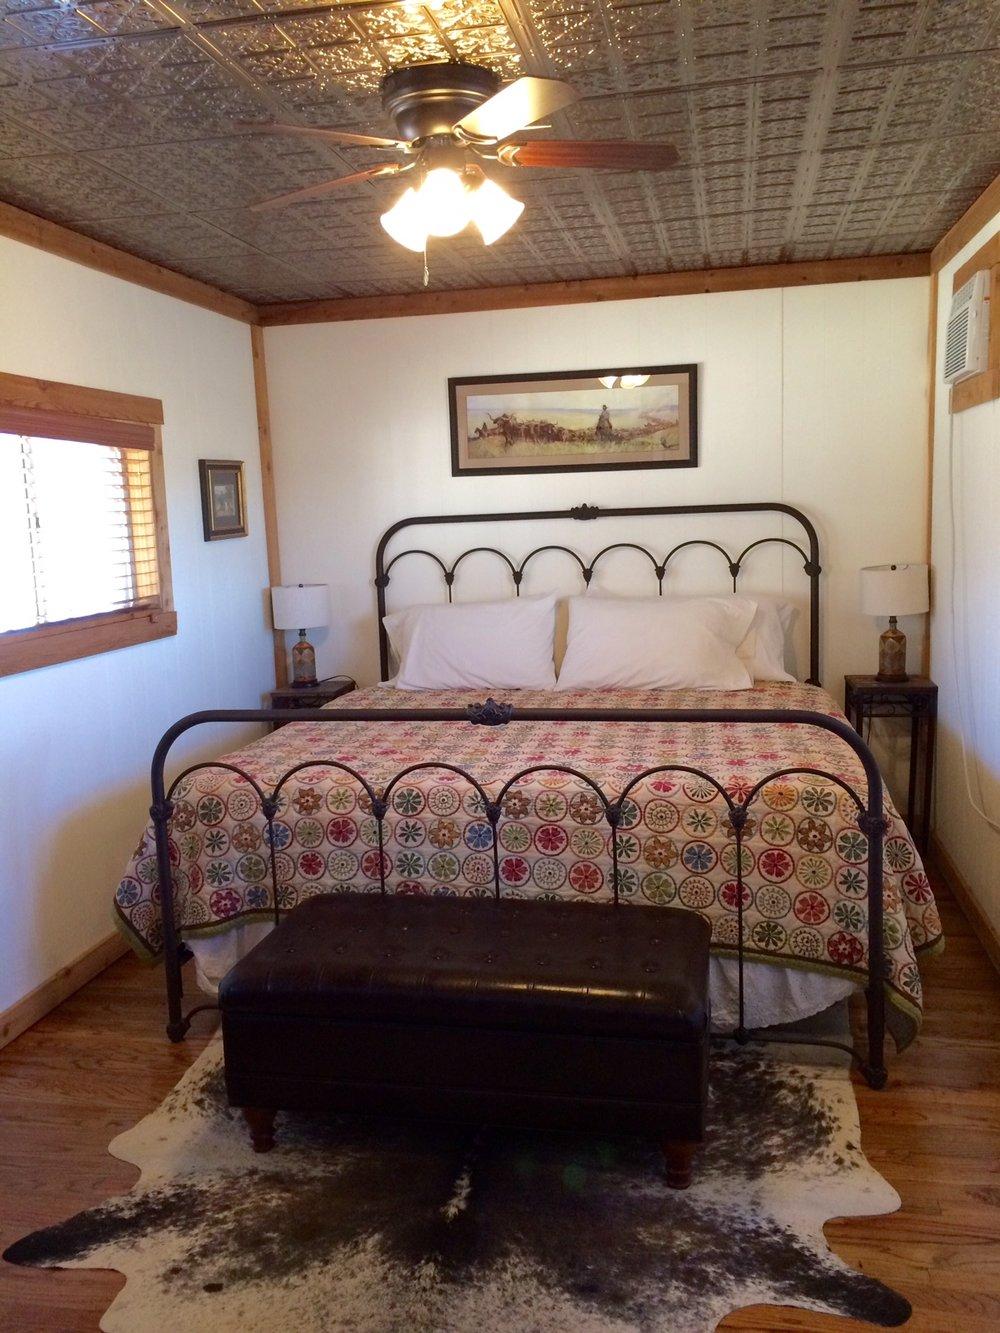 The Calaboose bedroom